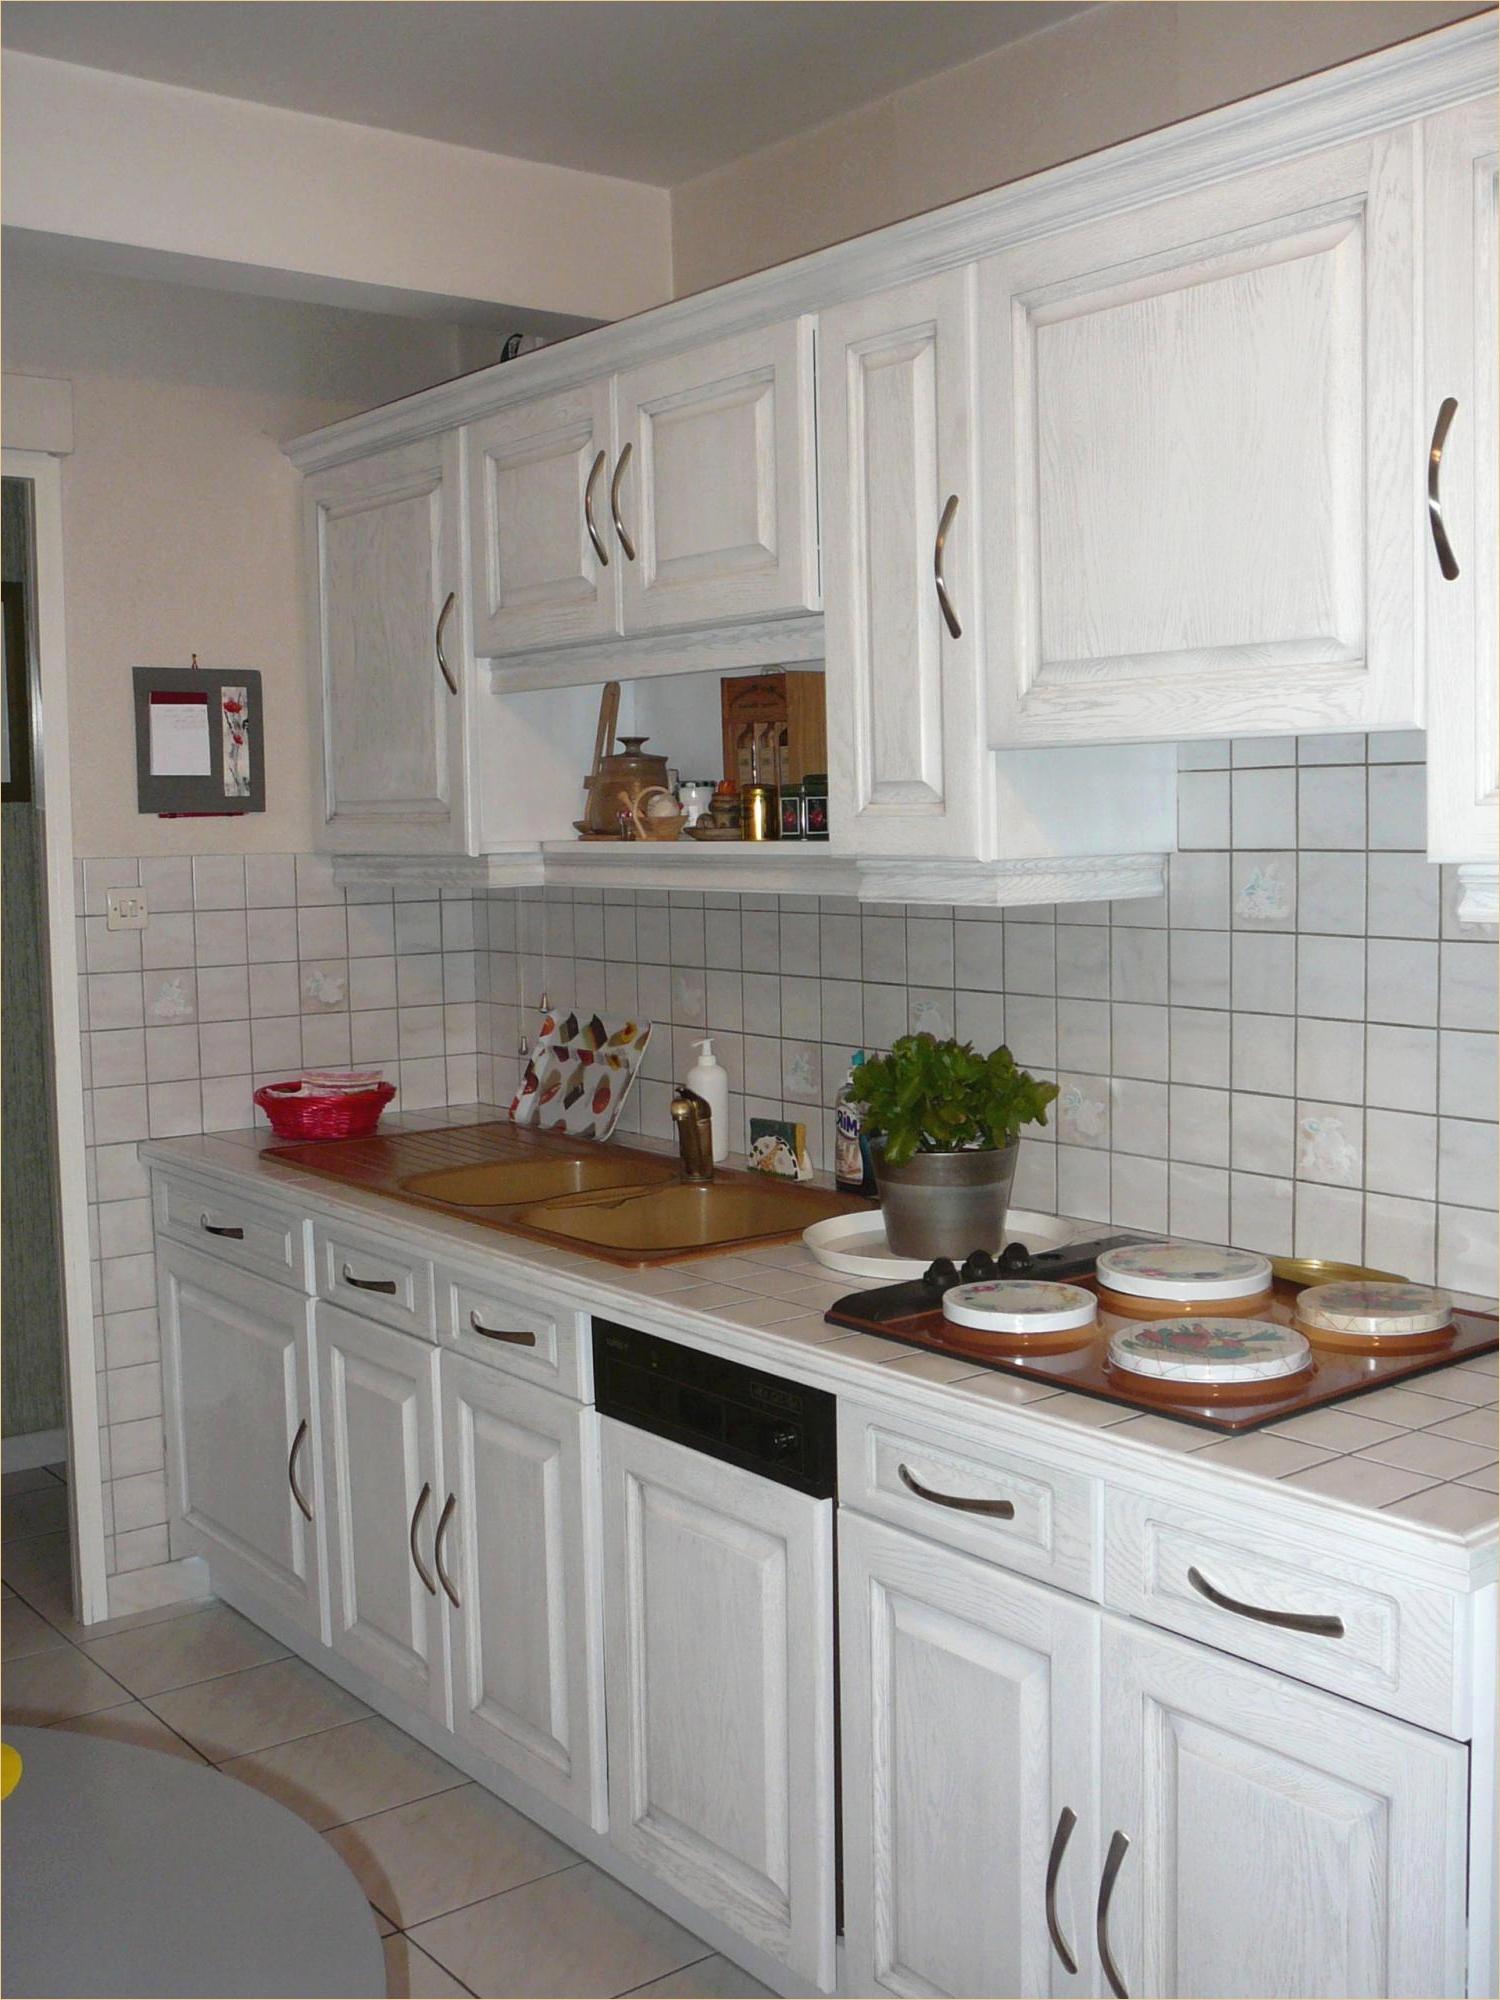 Cuisine Aubergine Et Gris Beau Images Cuisine Grise Et Aubergine Meuble Cuisine Aubergine Dans Cuisine